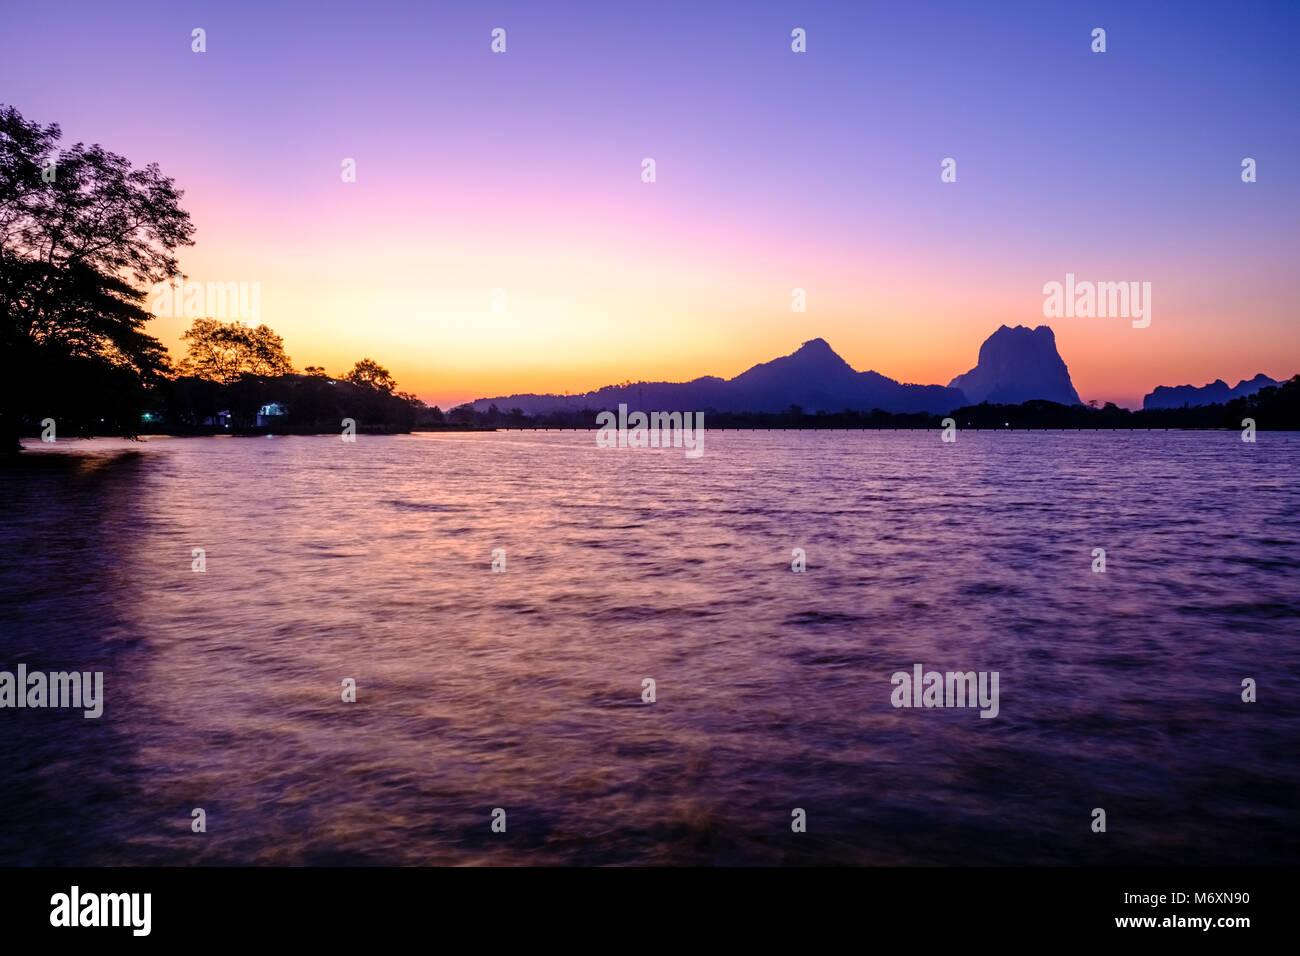 Mt. Zwegabin, si vede attraverso Kan Thar Yar lago di sunrise Immagini Stock